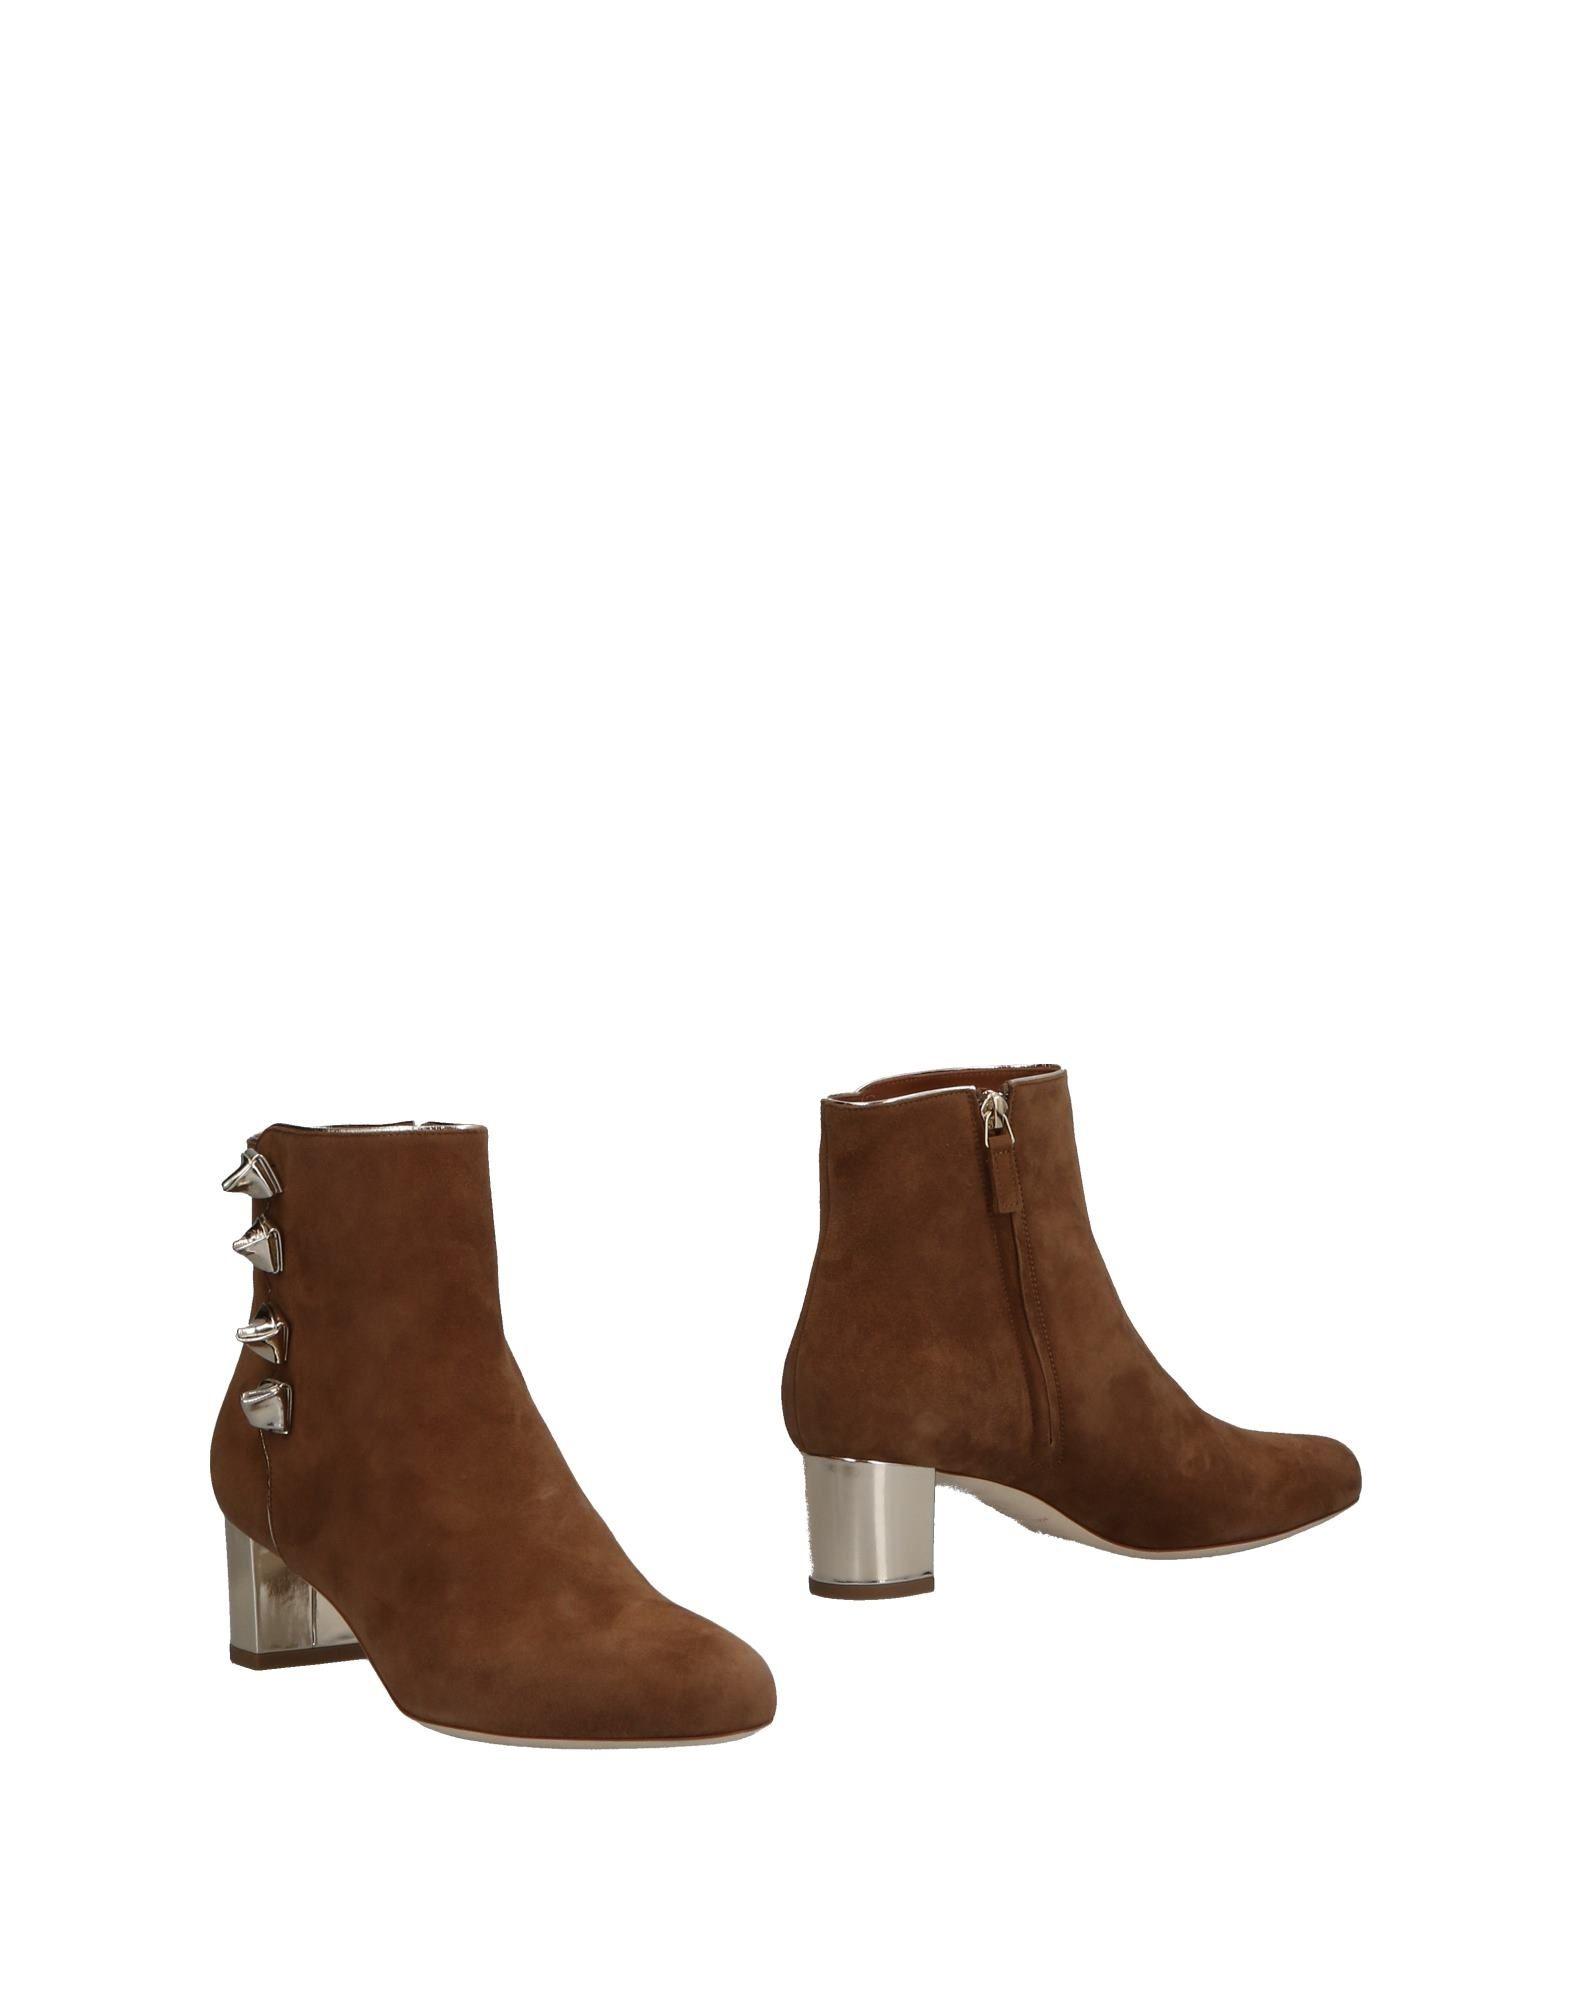 malone malone malone souliers bottines - femmes malone souliers bottes en ligne au royaume - uni - 11499415cd f4cce9